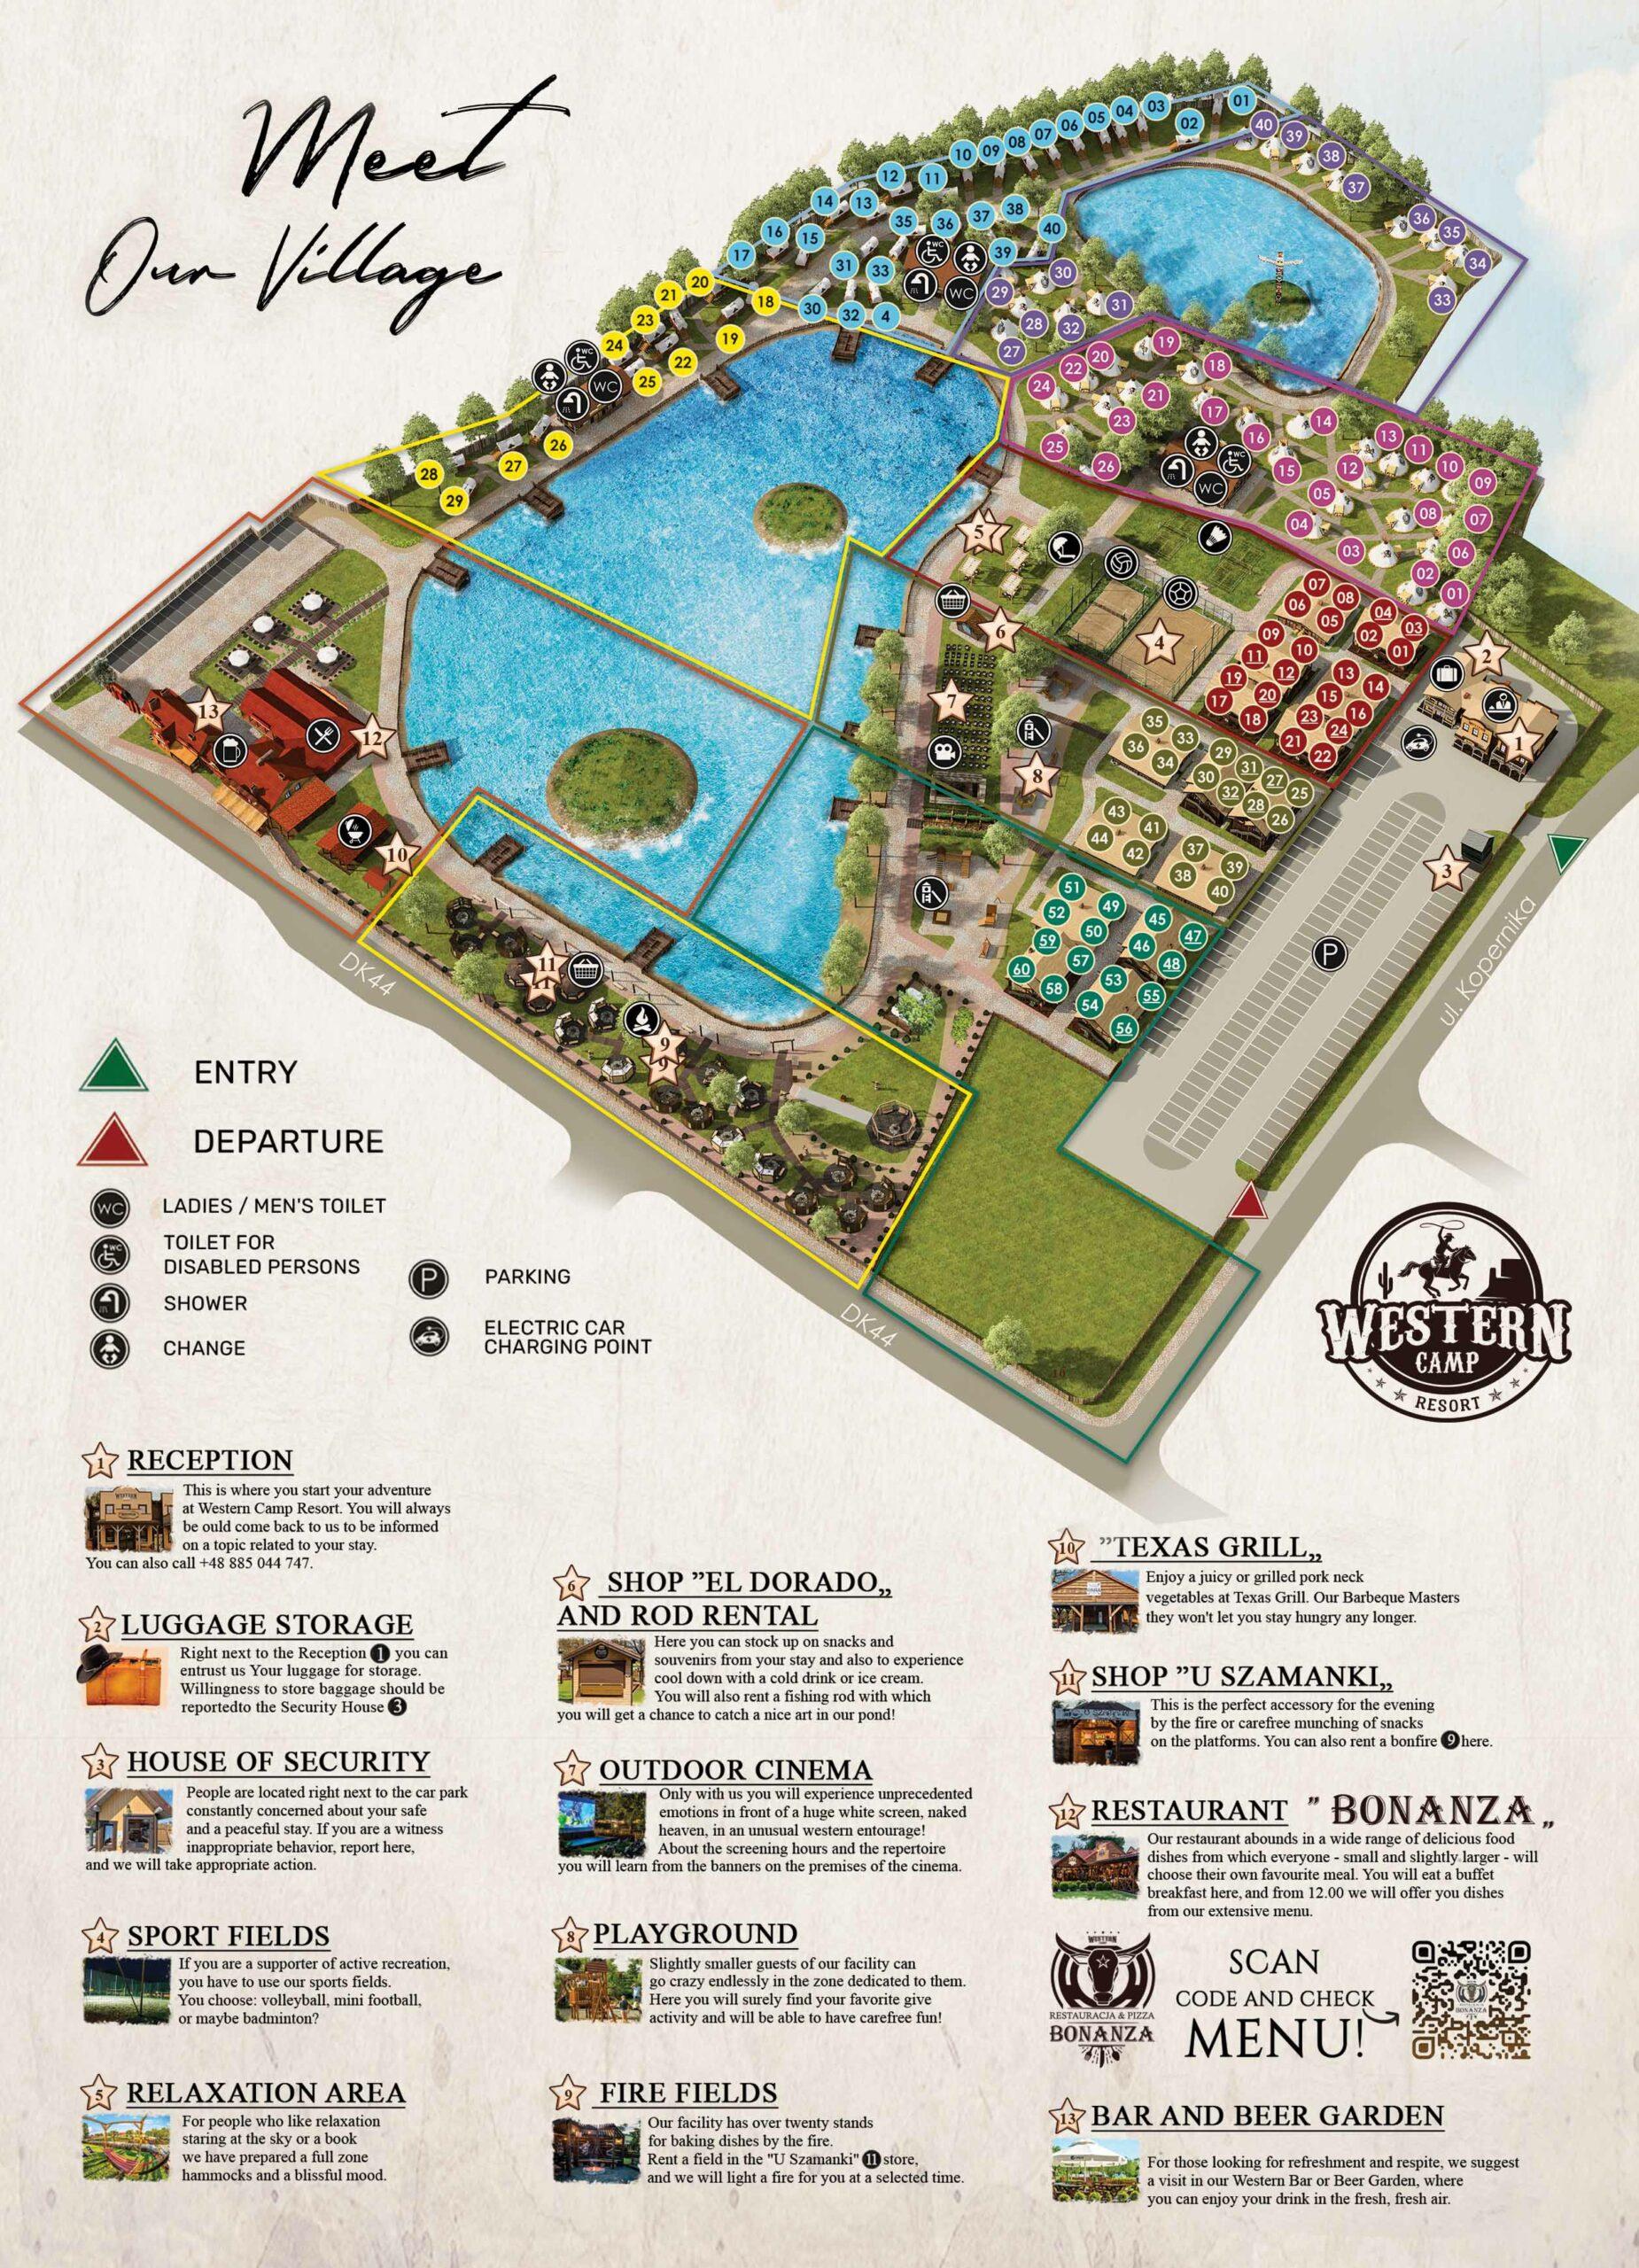 https://westerncamp.pl/wp-content/uploads/2021/05/Mapa-2021-osrodka-Western-Camp.jpg